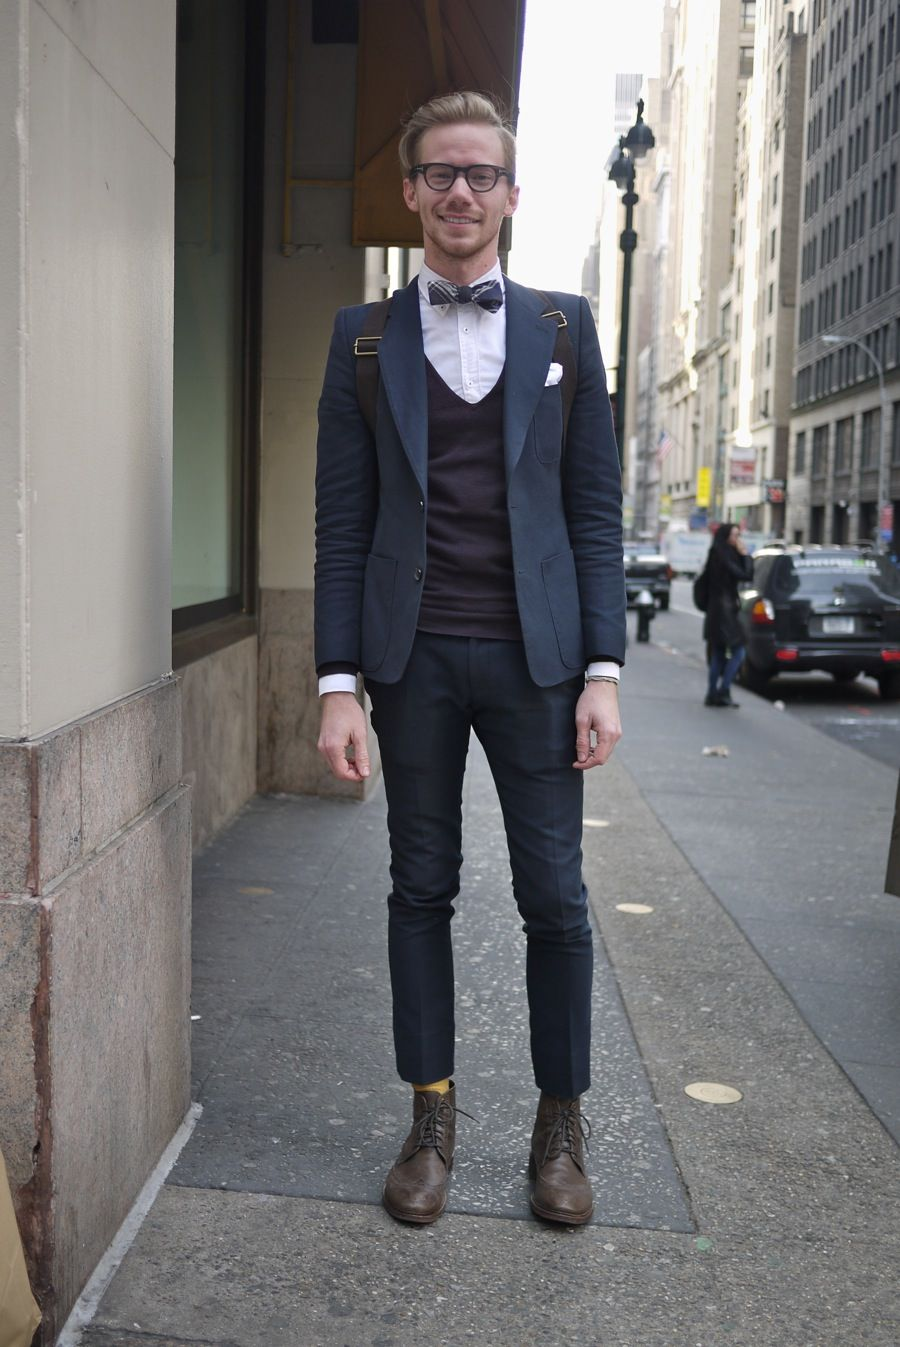 [ 街拍 ] 好憋的西裝哪裡買 BY NO MORE BLUE JEANS | Blue jeans, Everyday objects, Fashion